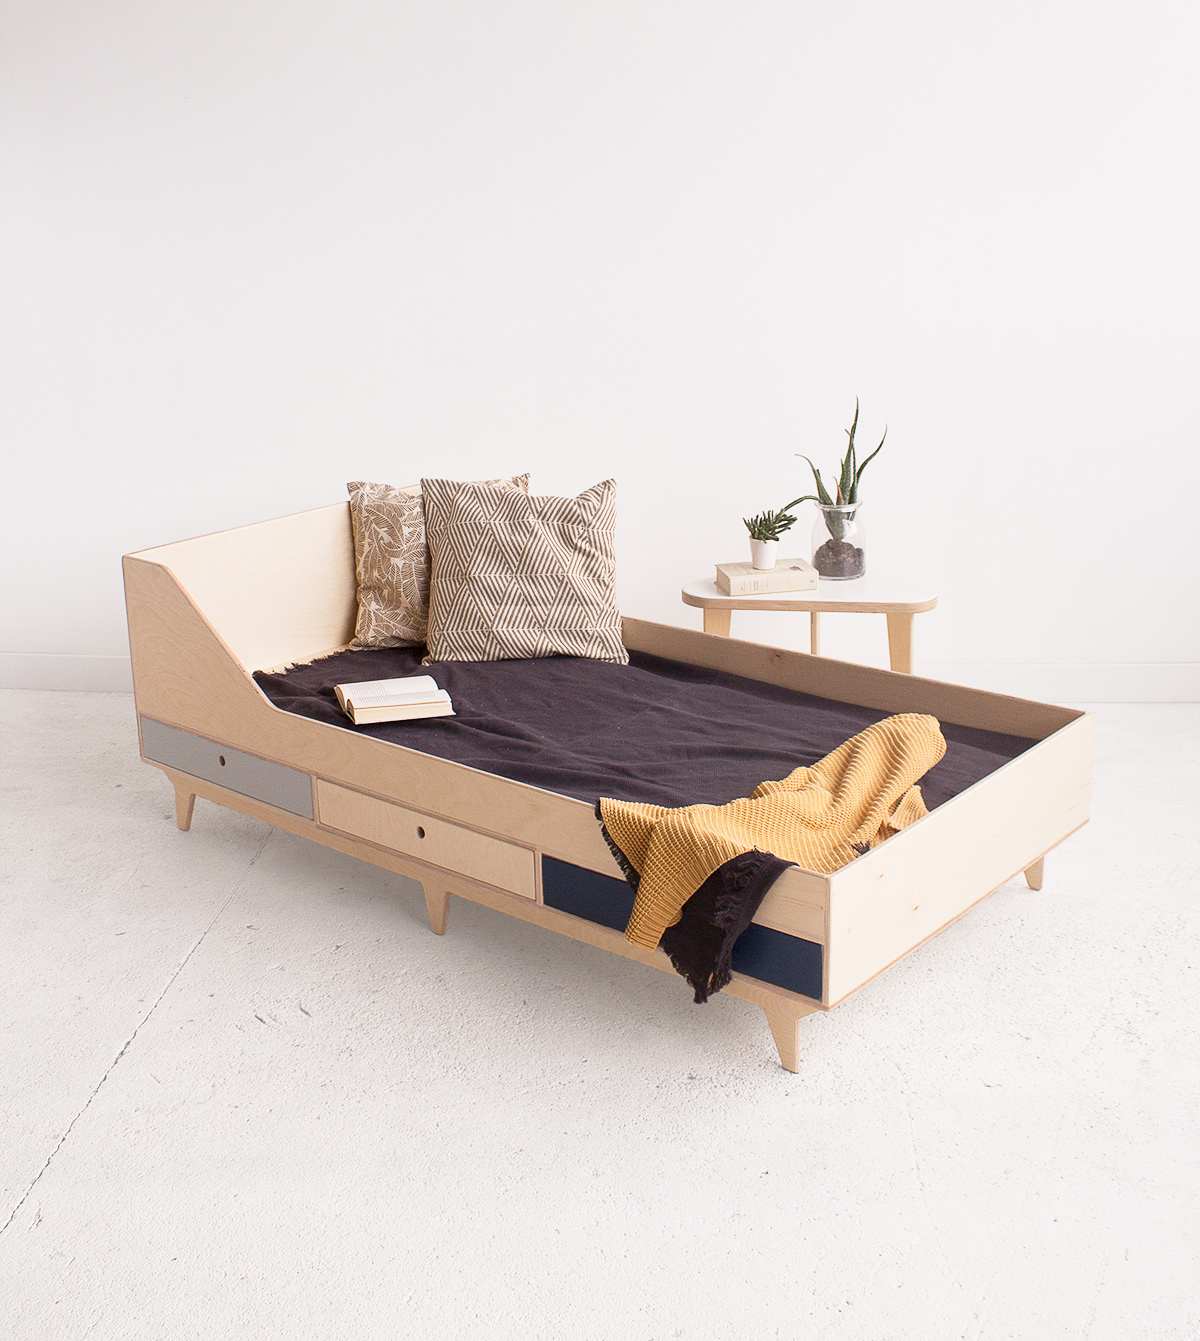 plywood bed custom handmade children